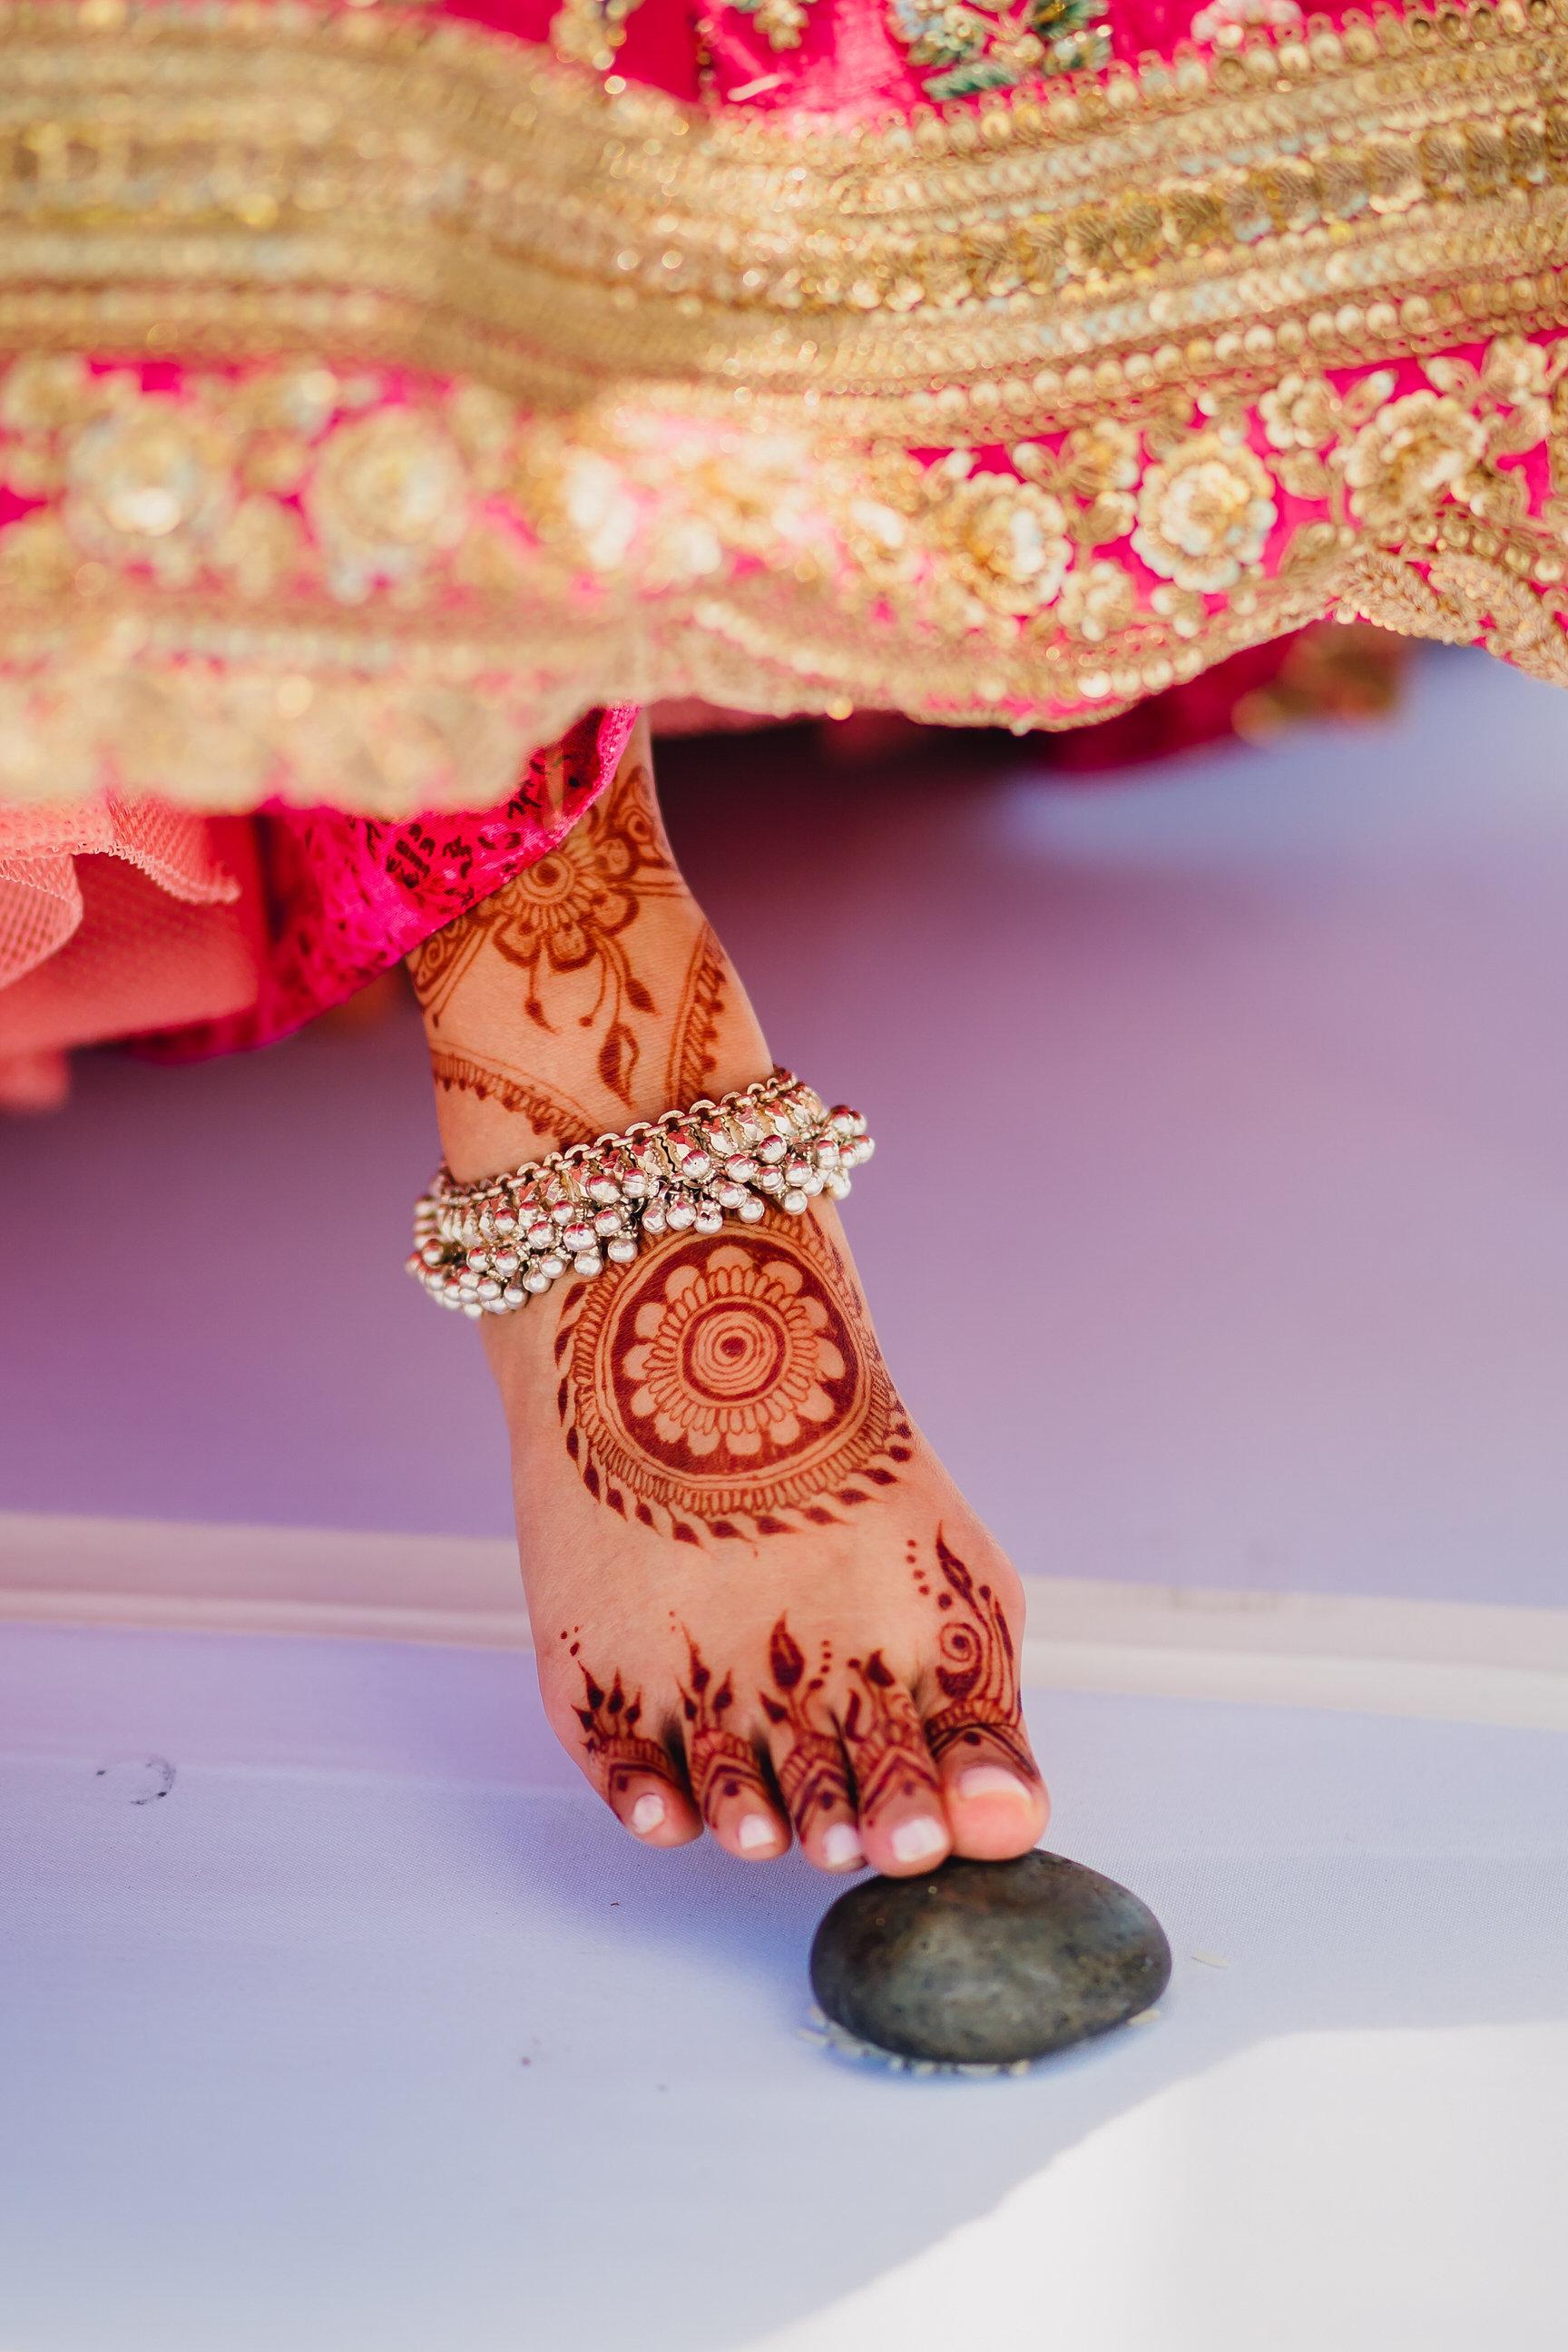 INDIAN WEDDING BRIDE WITH HENNA.JPG